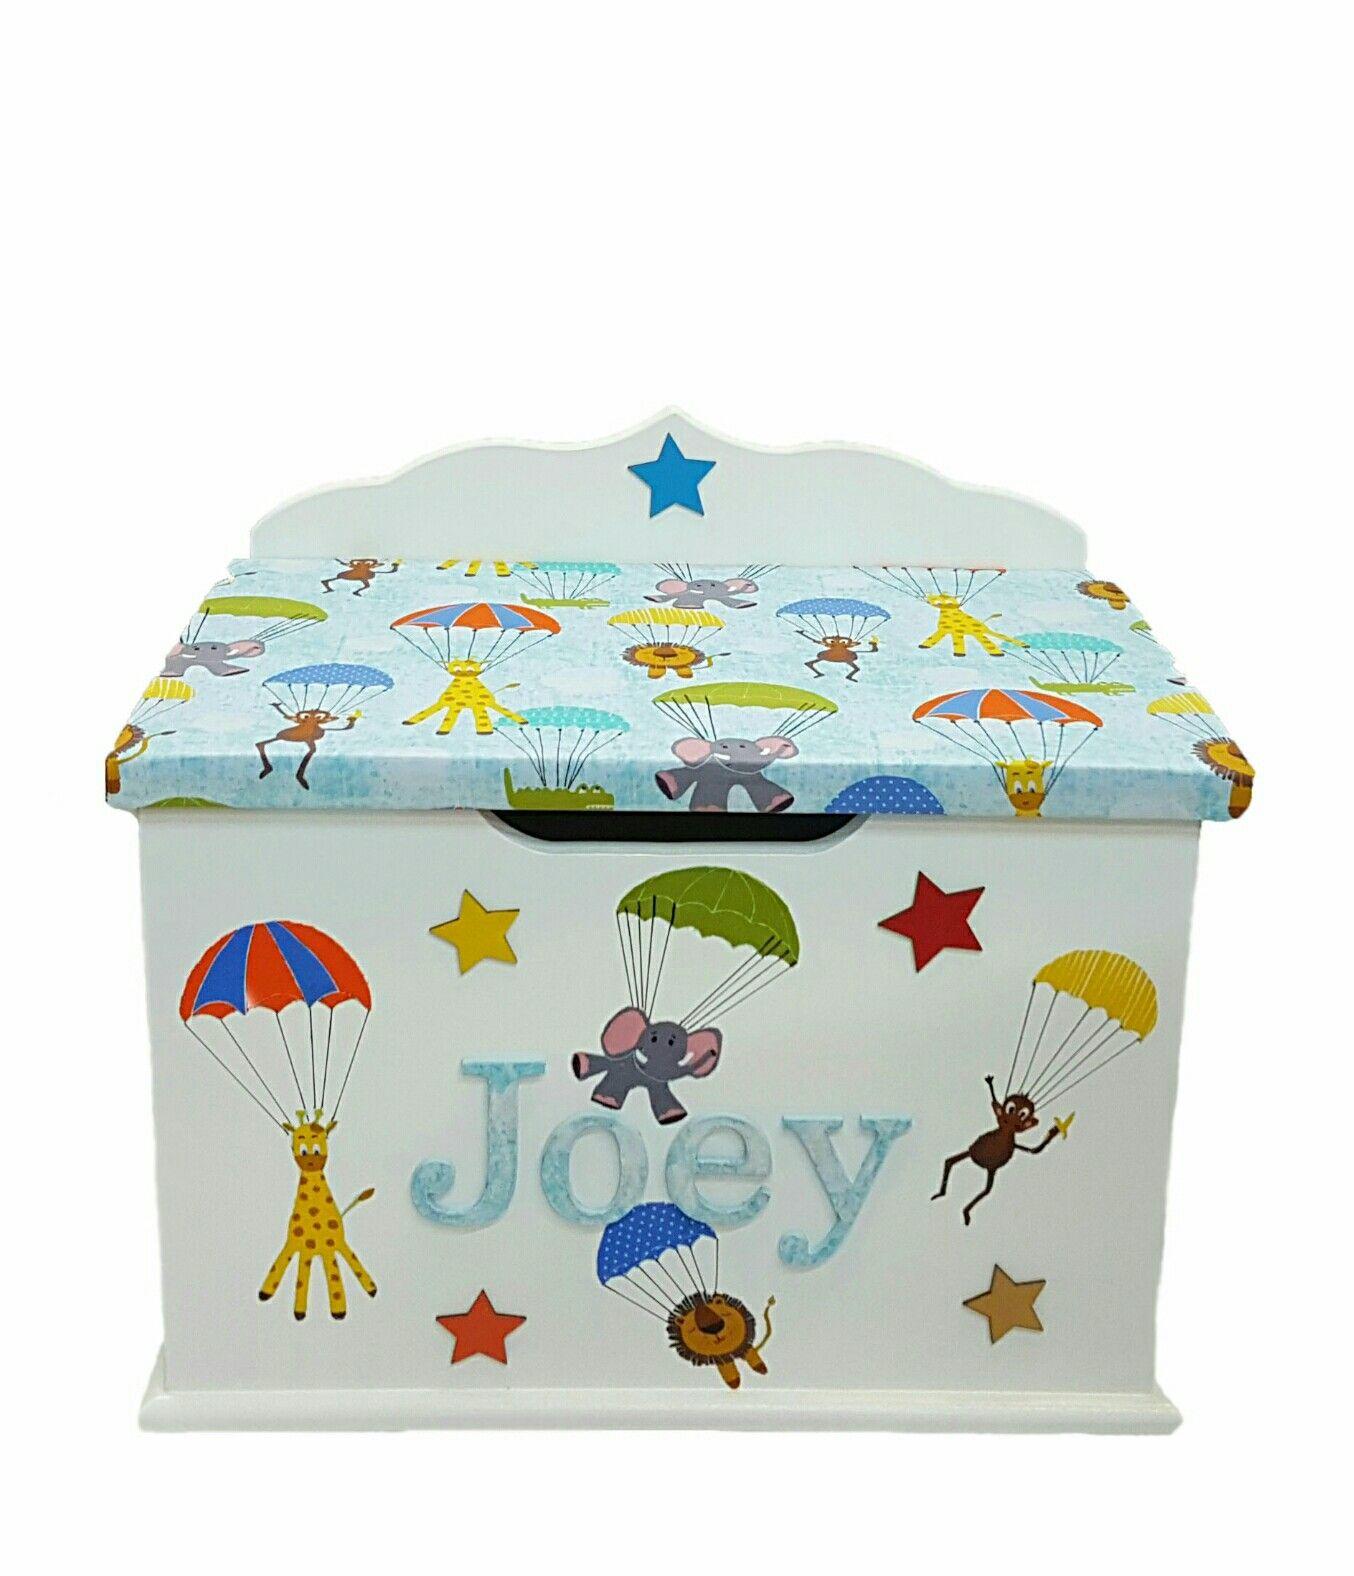 Personalised Toy Box Children Baby Kids First Birthday Christmas Bespoke